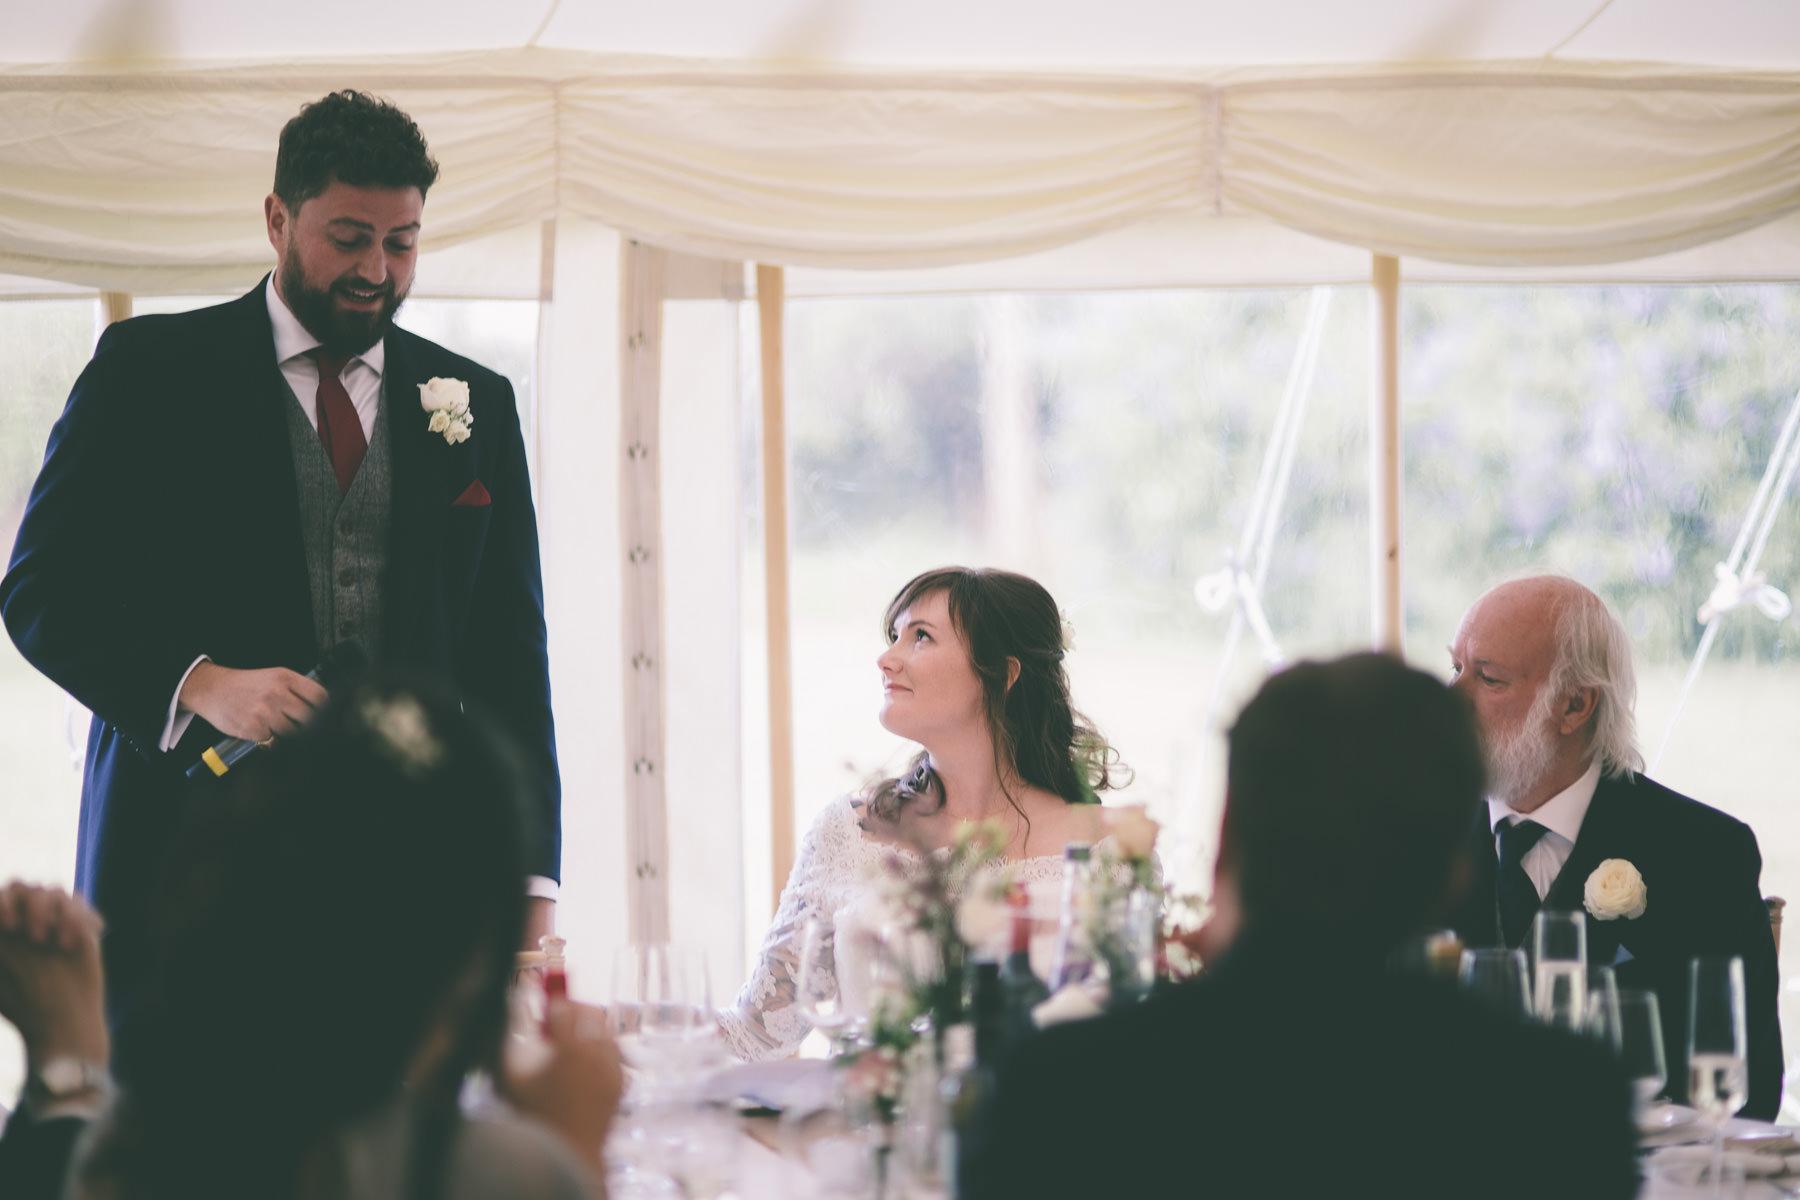 Pamber-Place-wedding-photography-basingstoke-hampshire-219